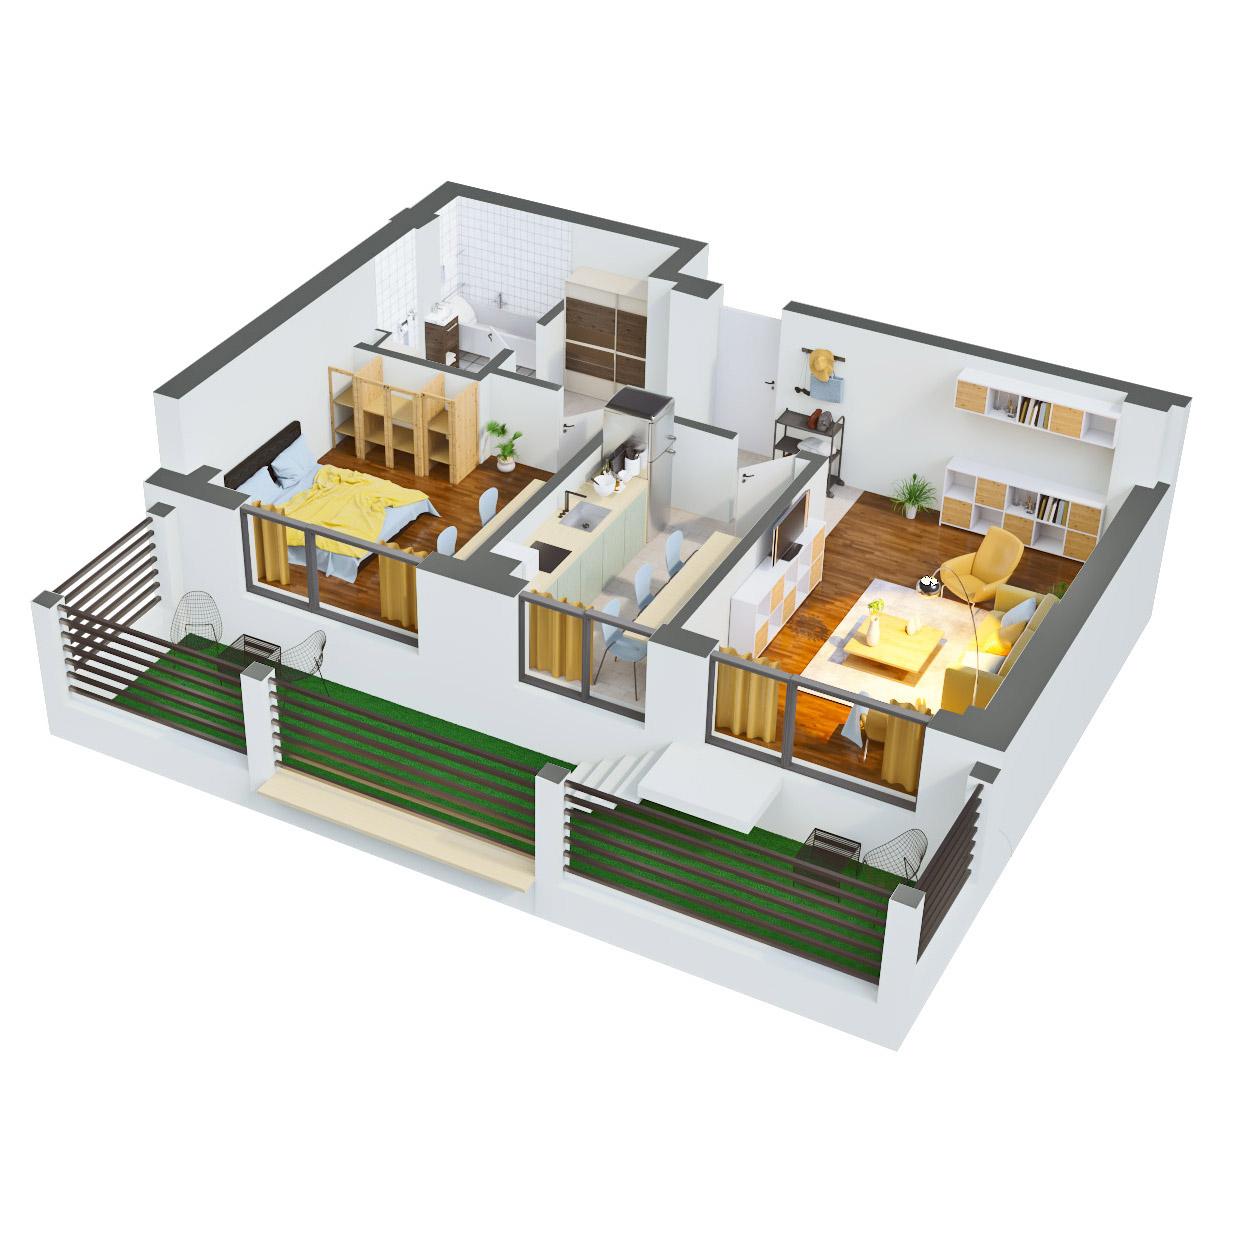 Apartament 2 camere de vanzare Bucuresti - Catedral Residence - Marriott, Piata Unirii, 13 Septembrie, Izvor - Tip 5 - T2A - A